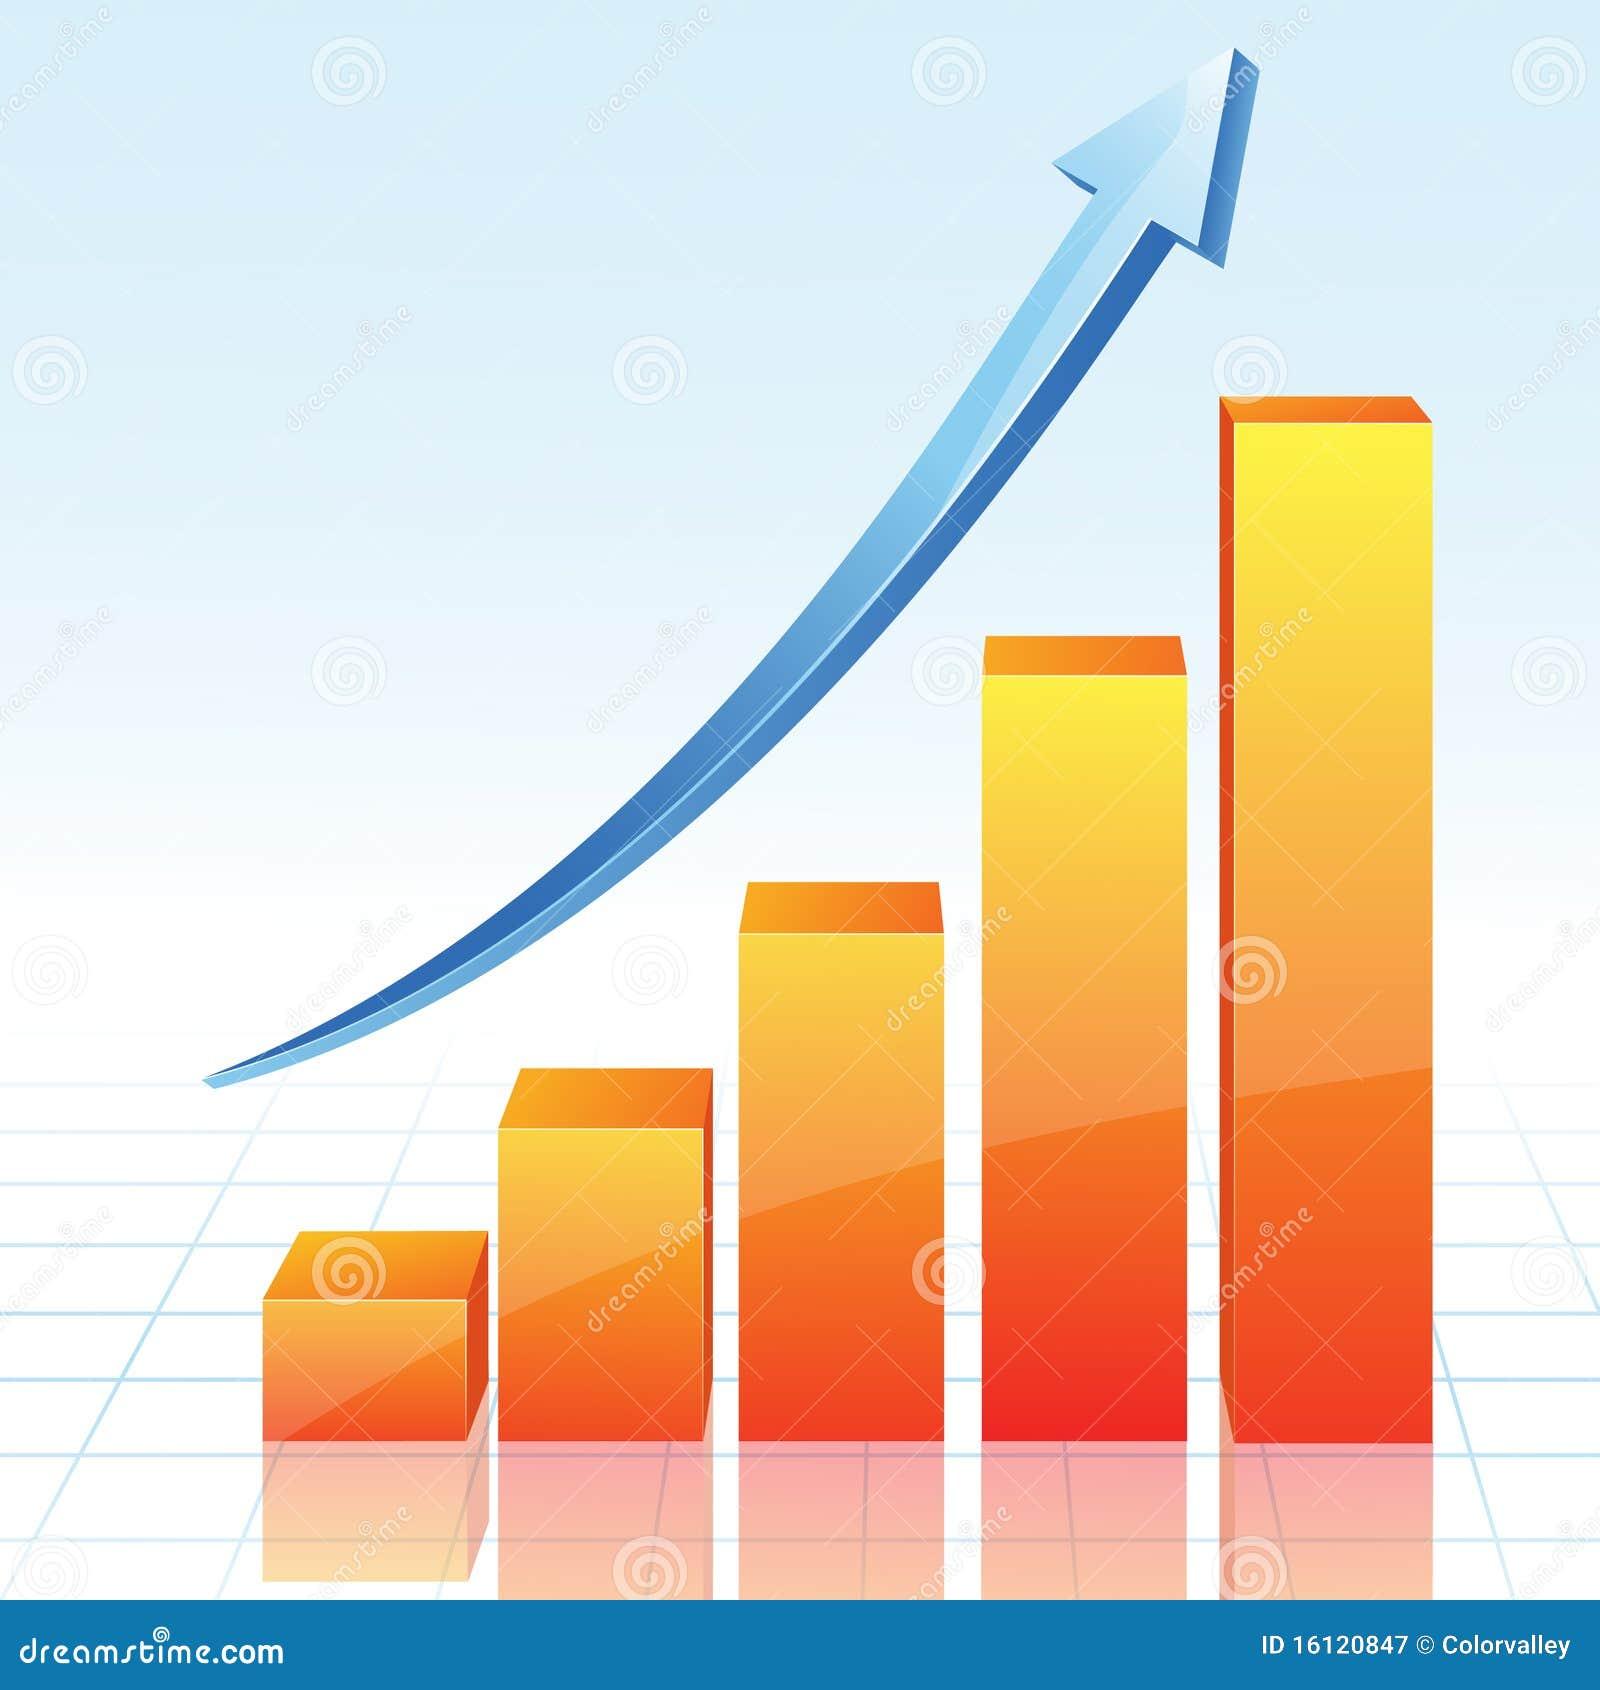 Vector Diagram Arrow Royalty Free Stock Photography